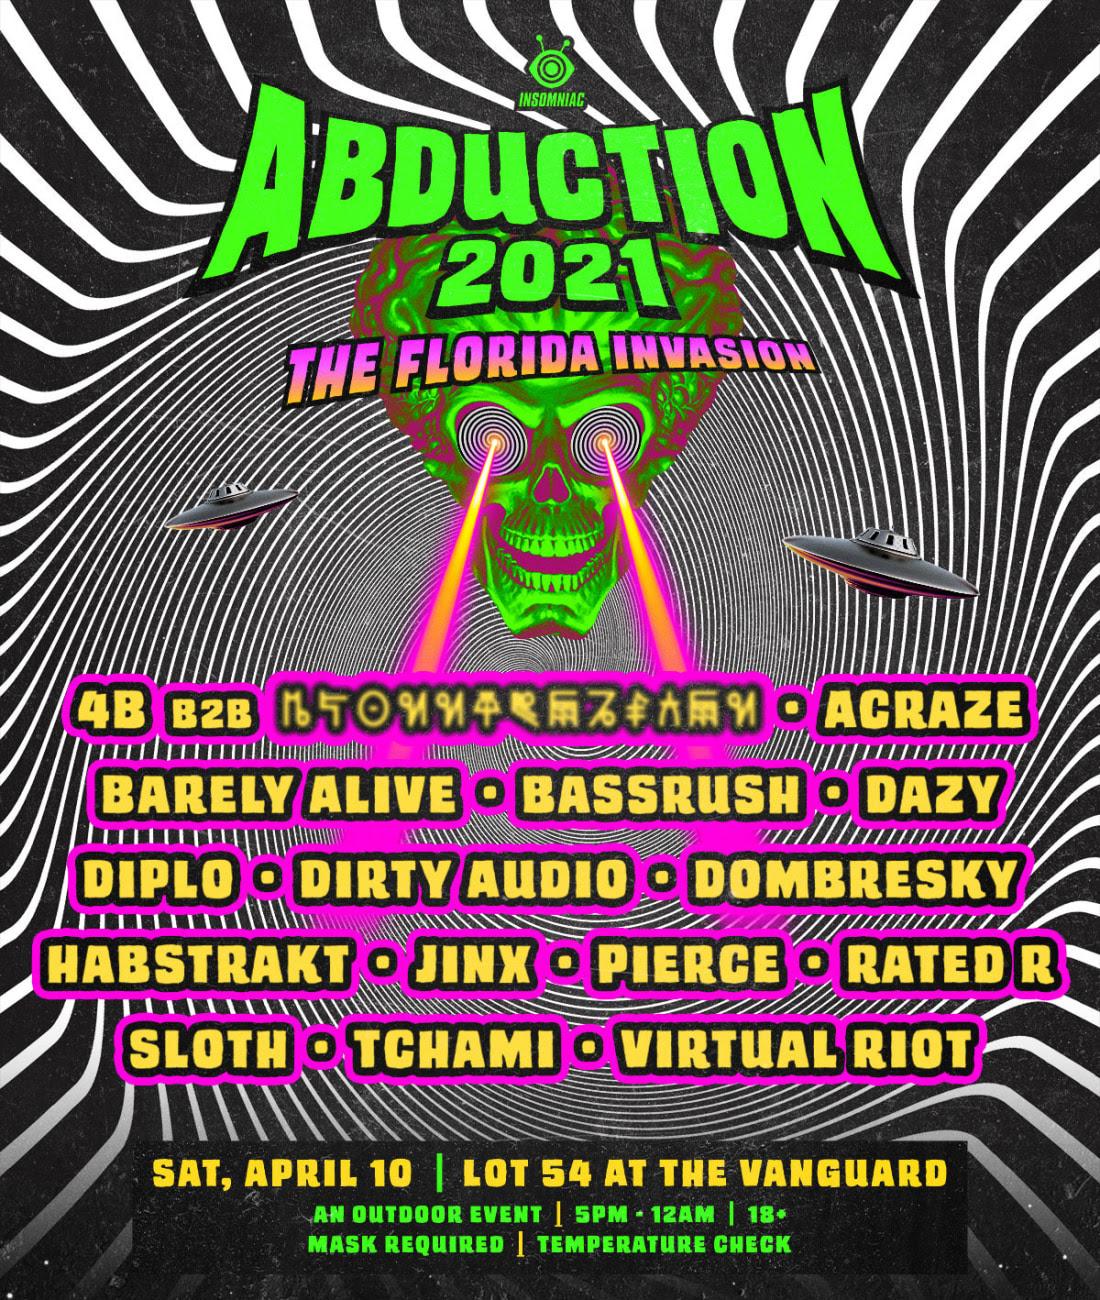 Abduction flyer